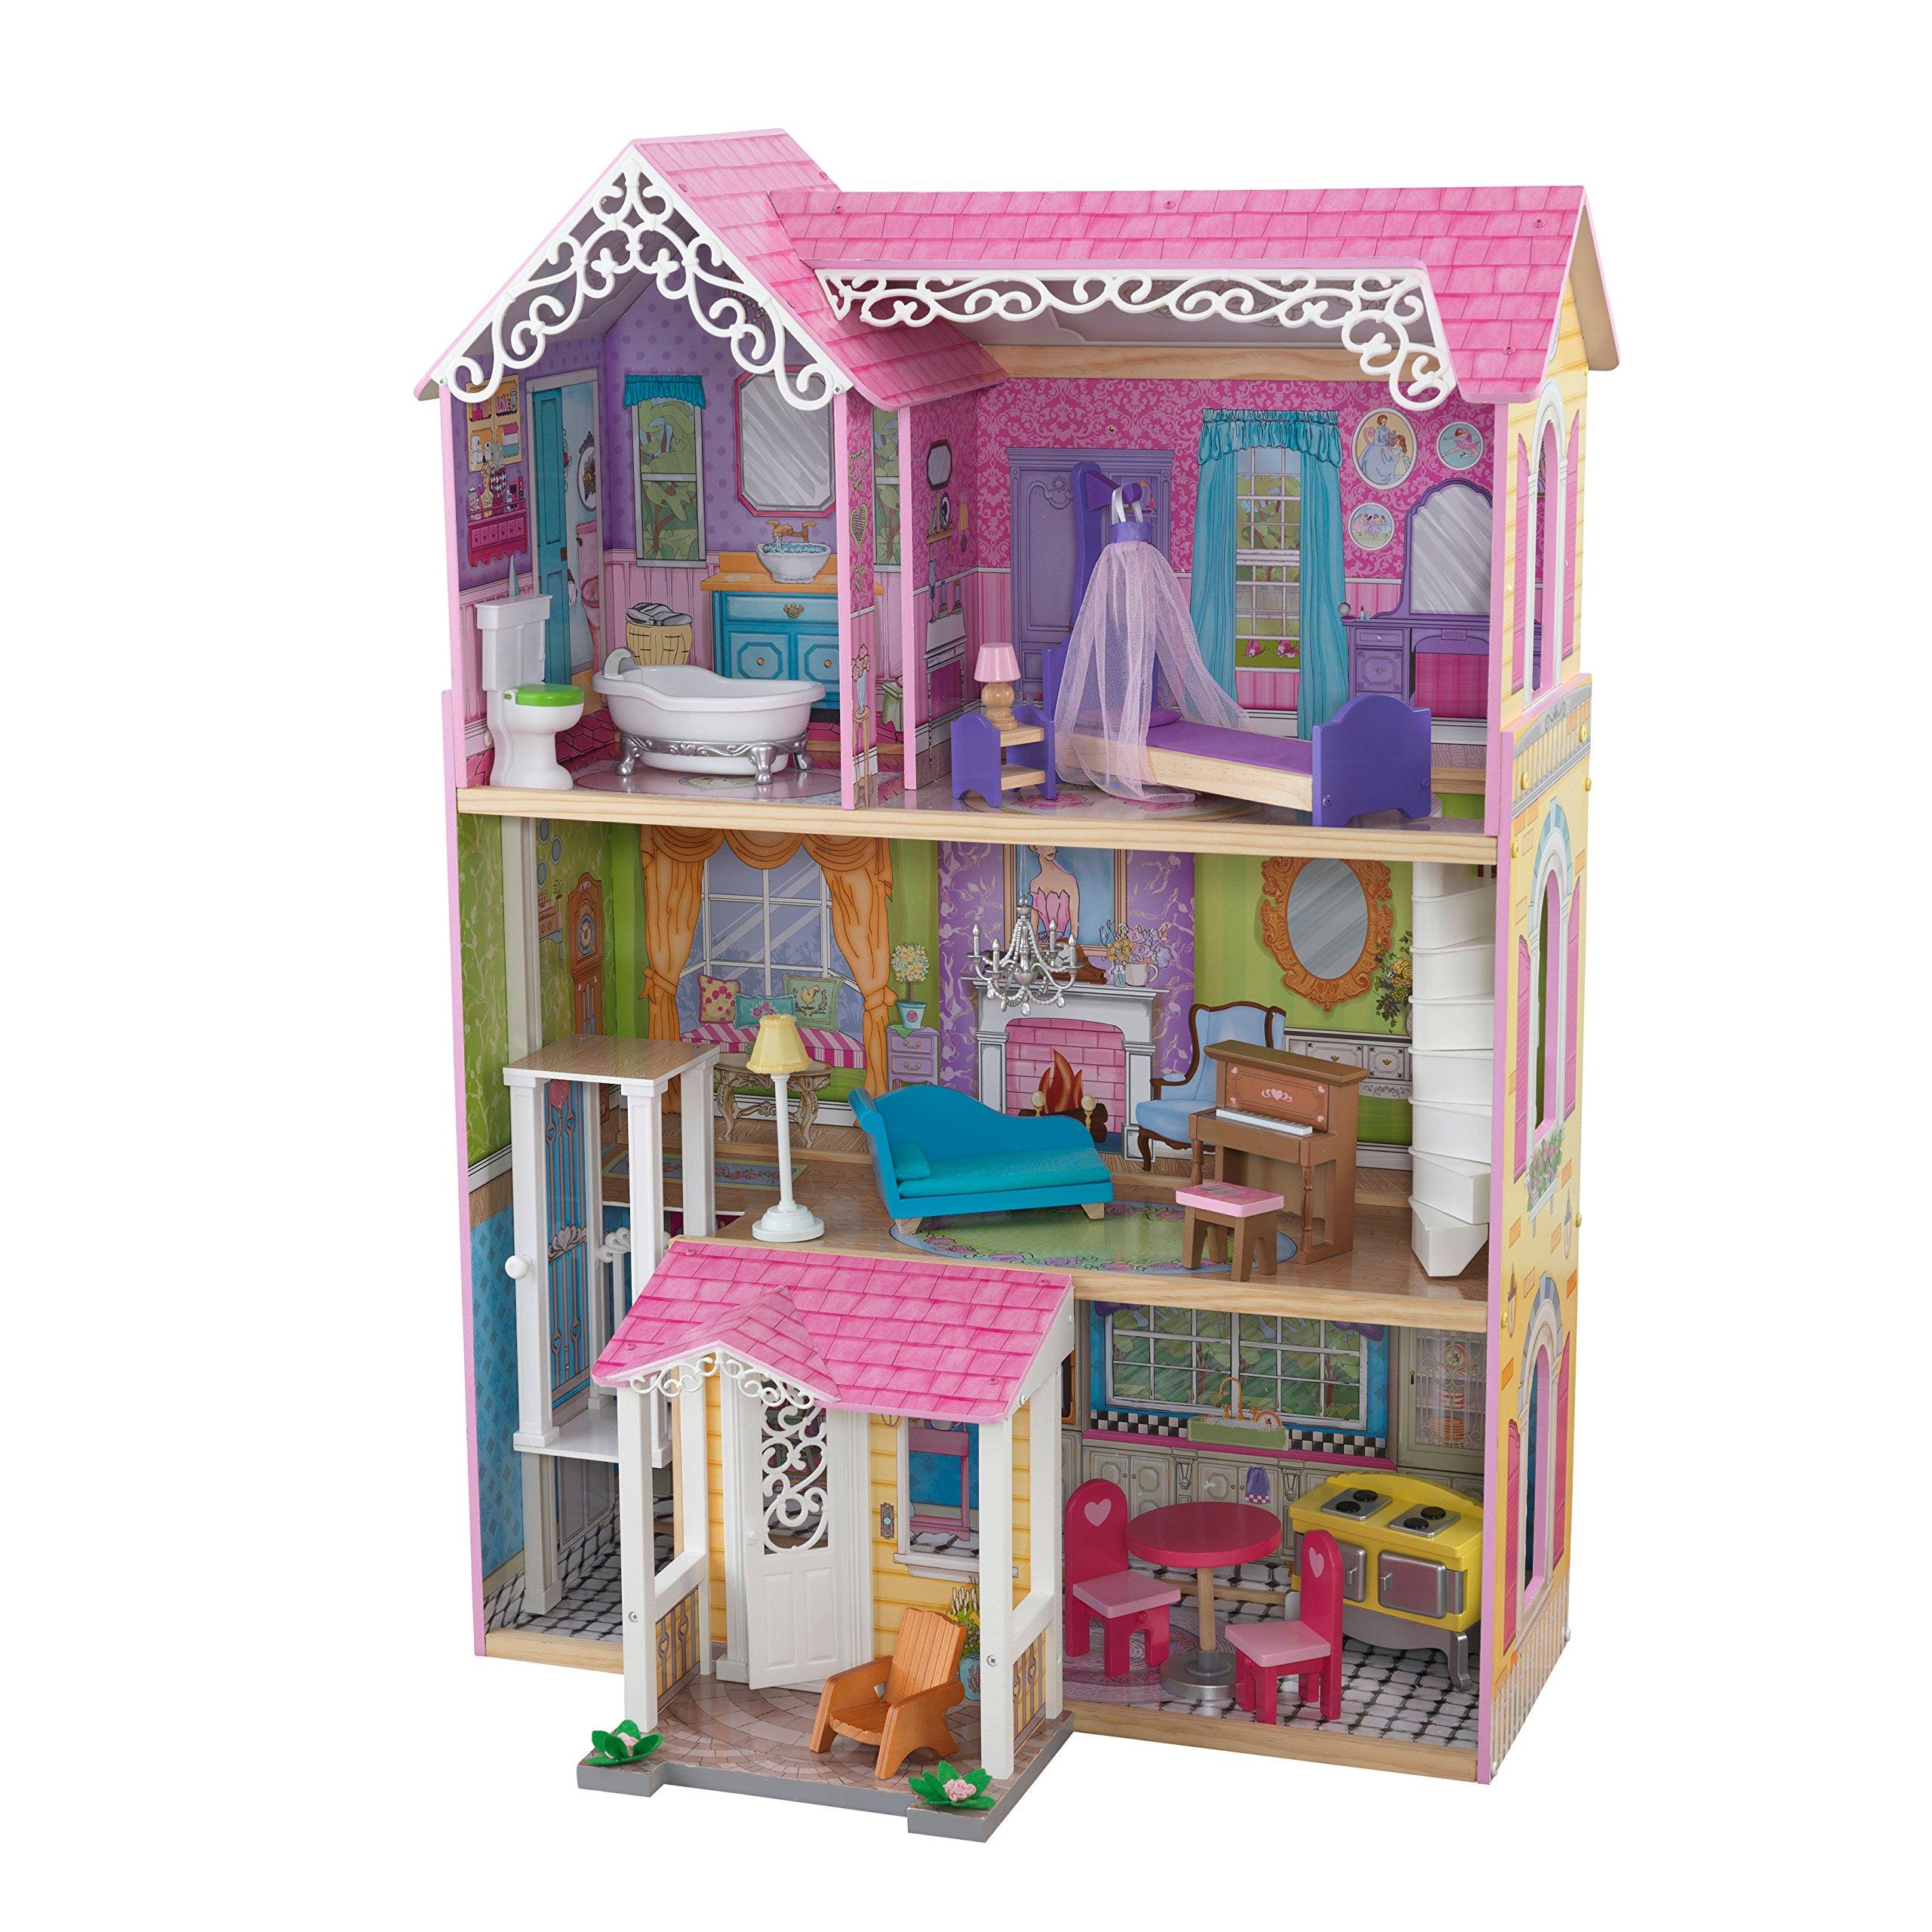 KidKraft Sweet & Pretty Dollhouse Toy by KidKraft (Image #1)